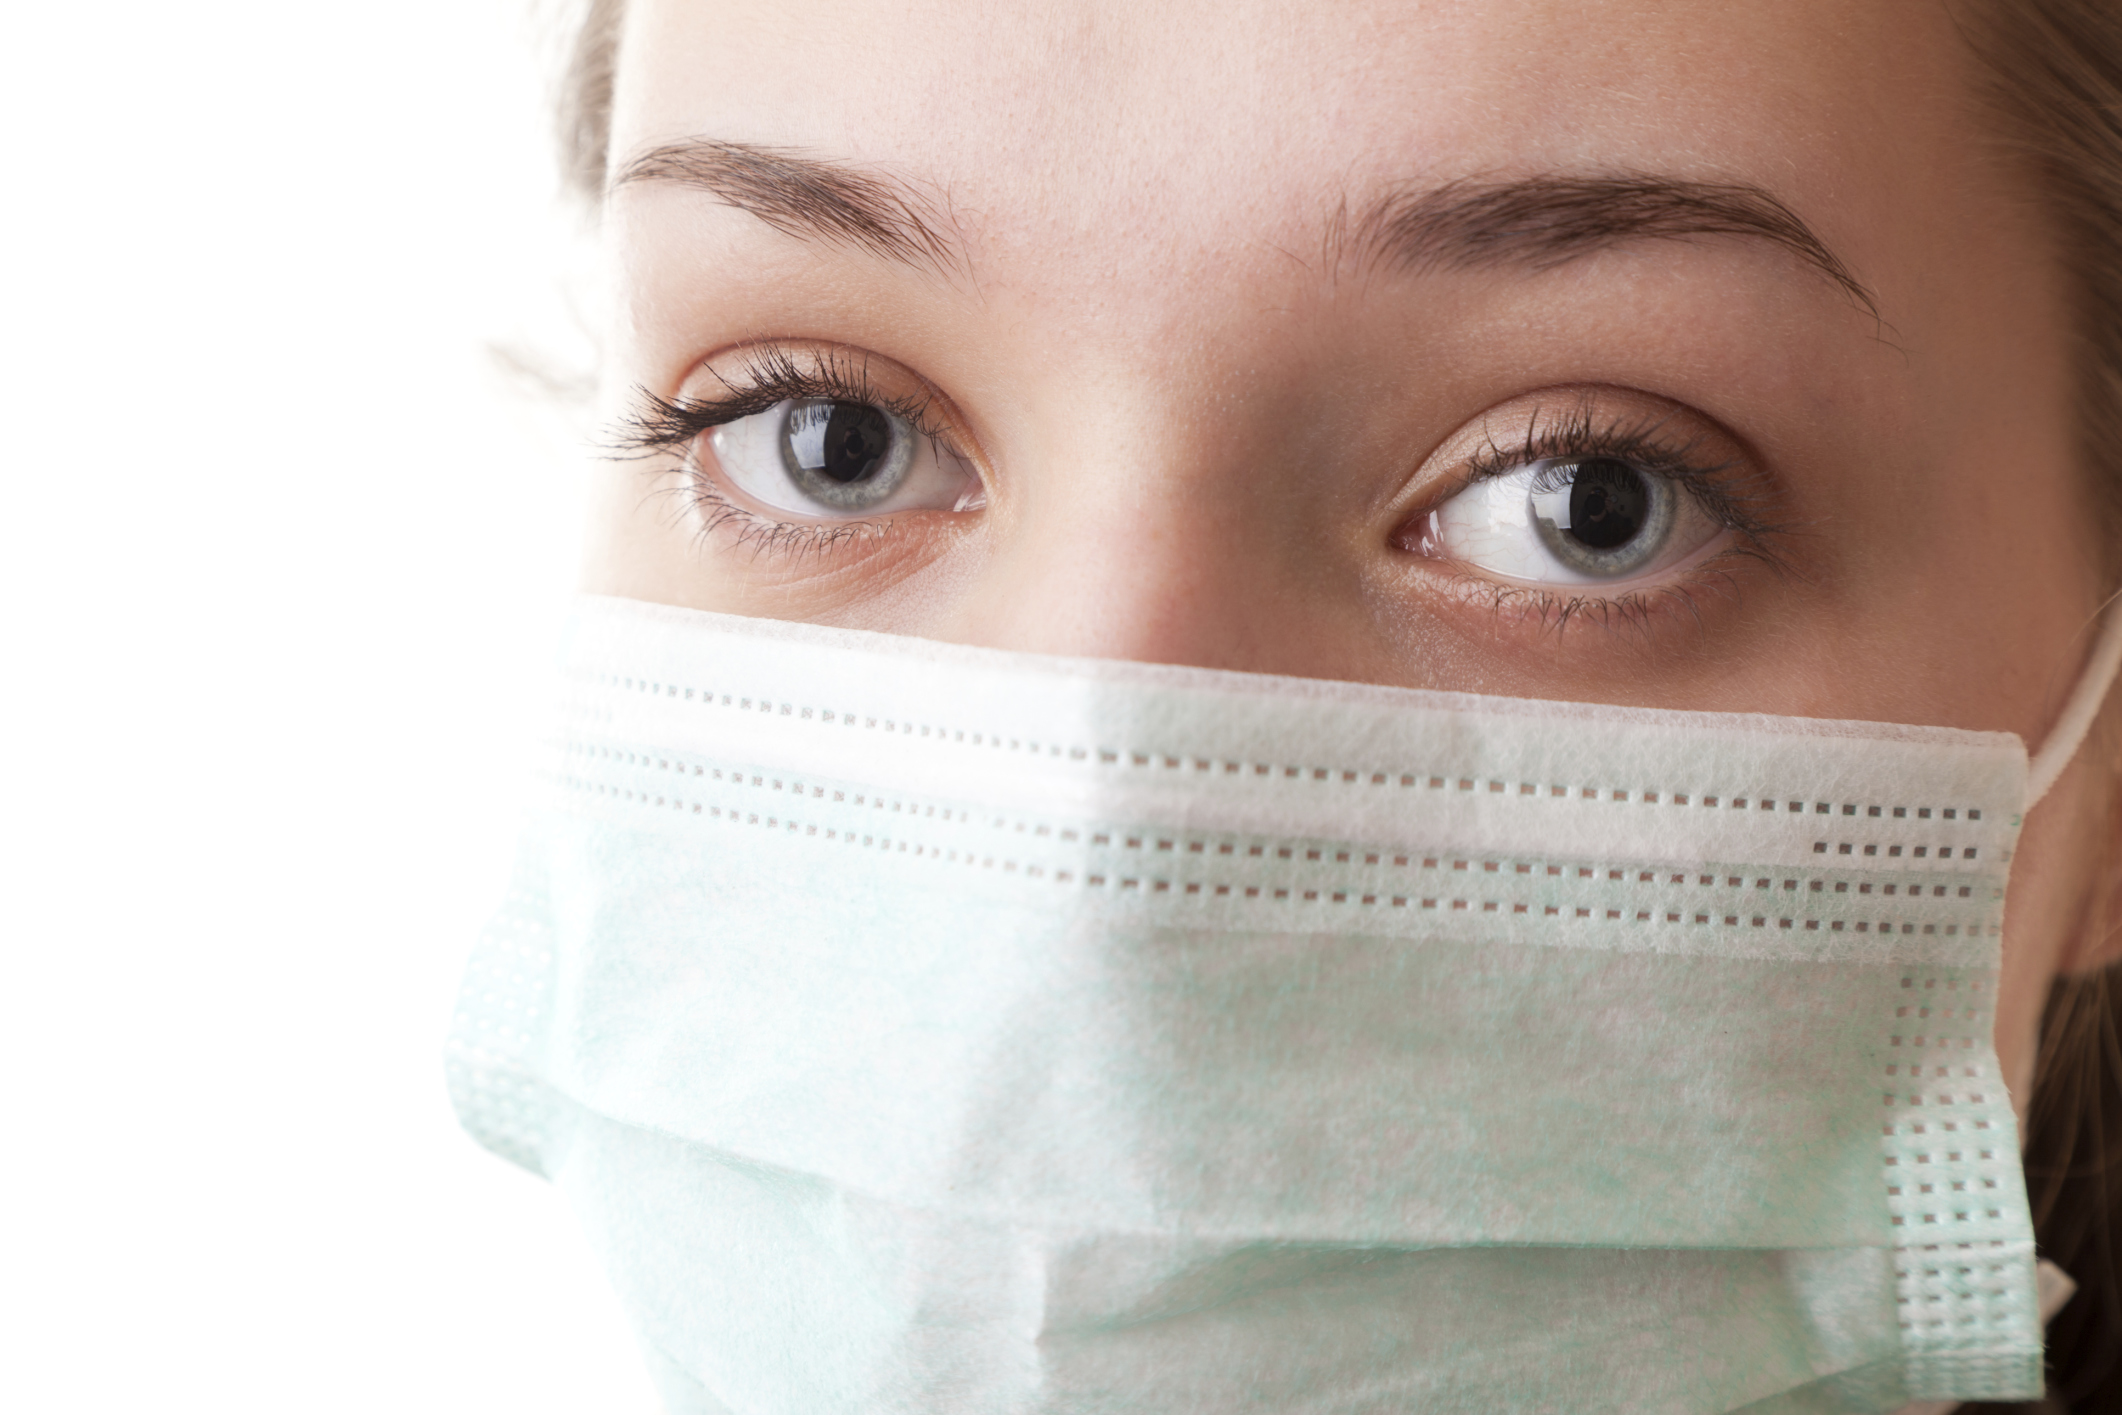 How hard has flu hit the D.C. area this season?